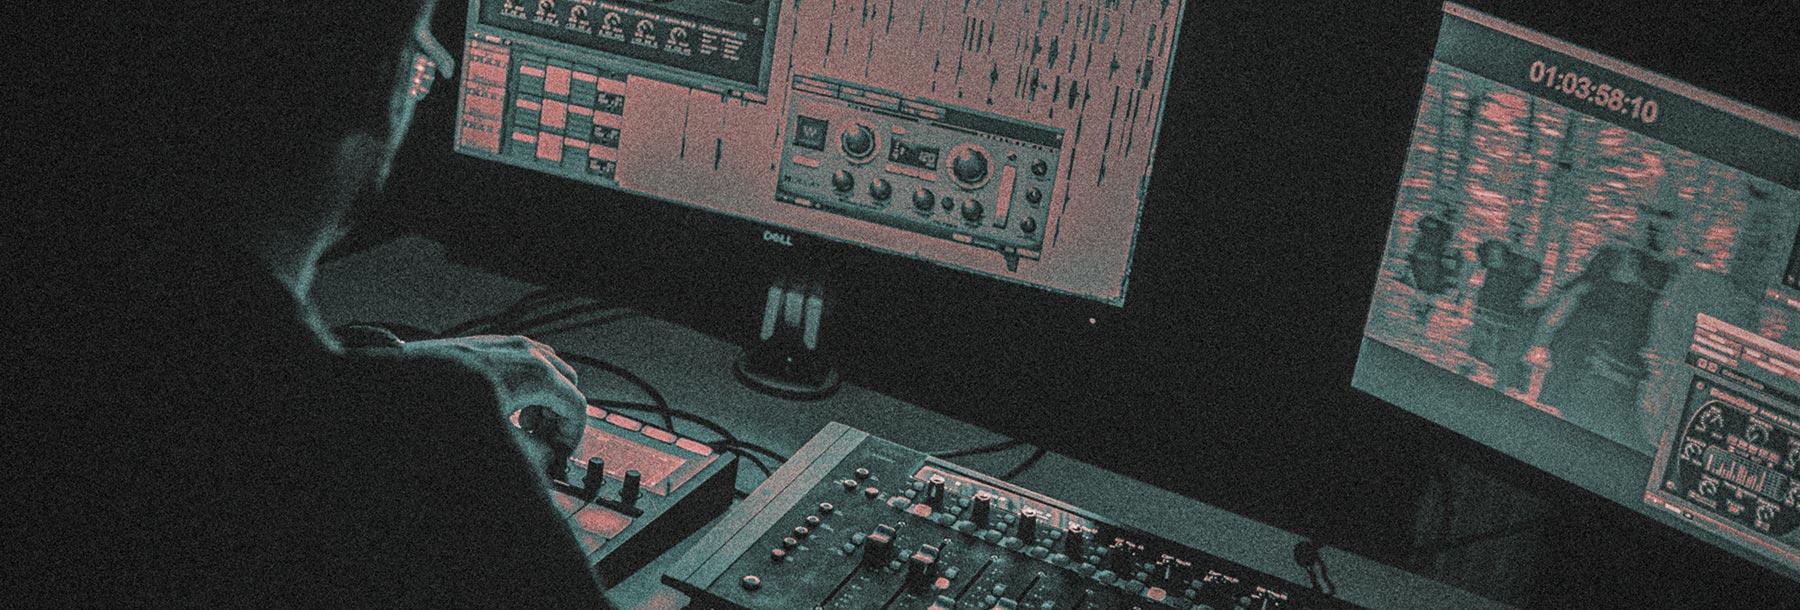 postred-audio-sound-design-soundtoys-waves-pro-tools-avid-artist-mix-ni-maschine